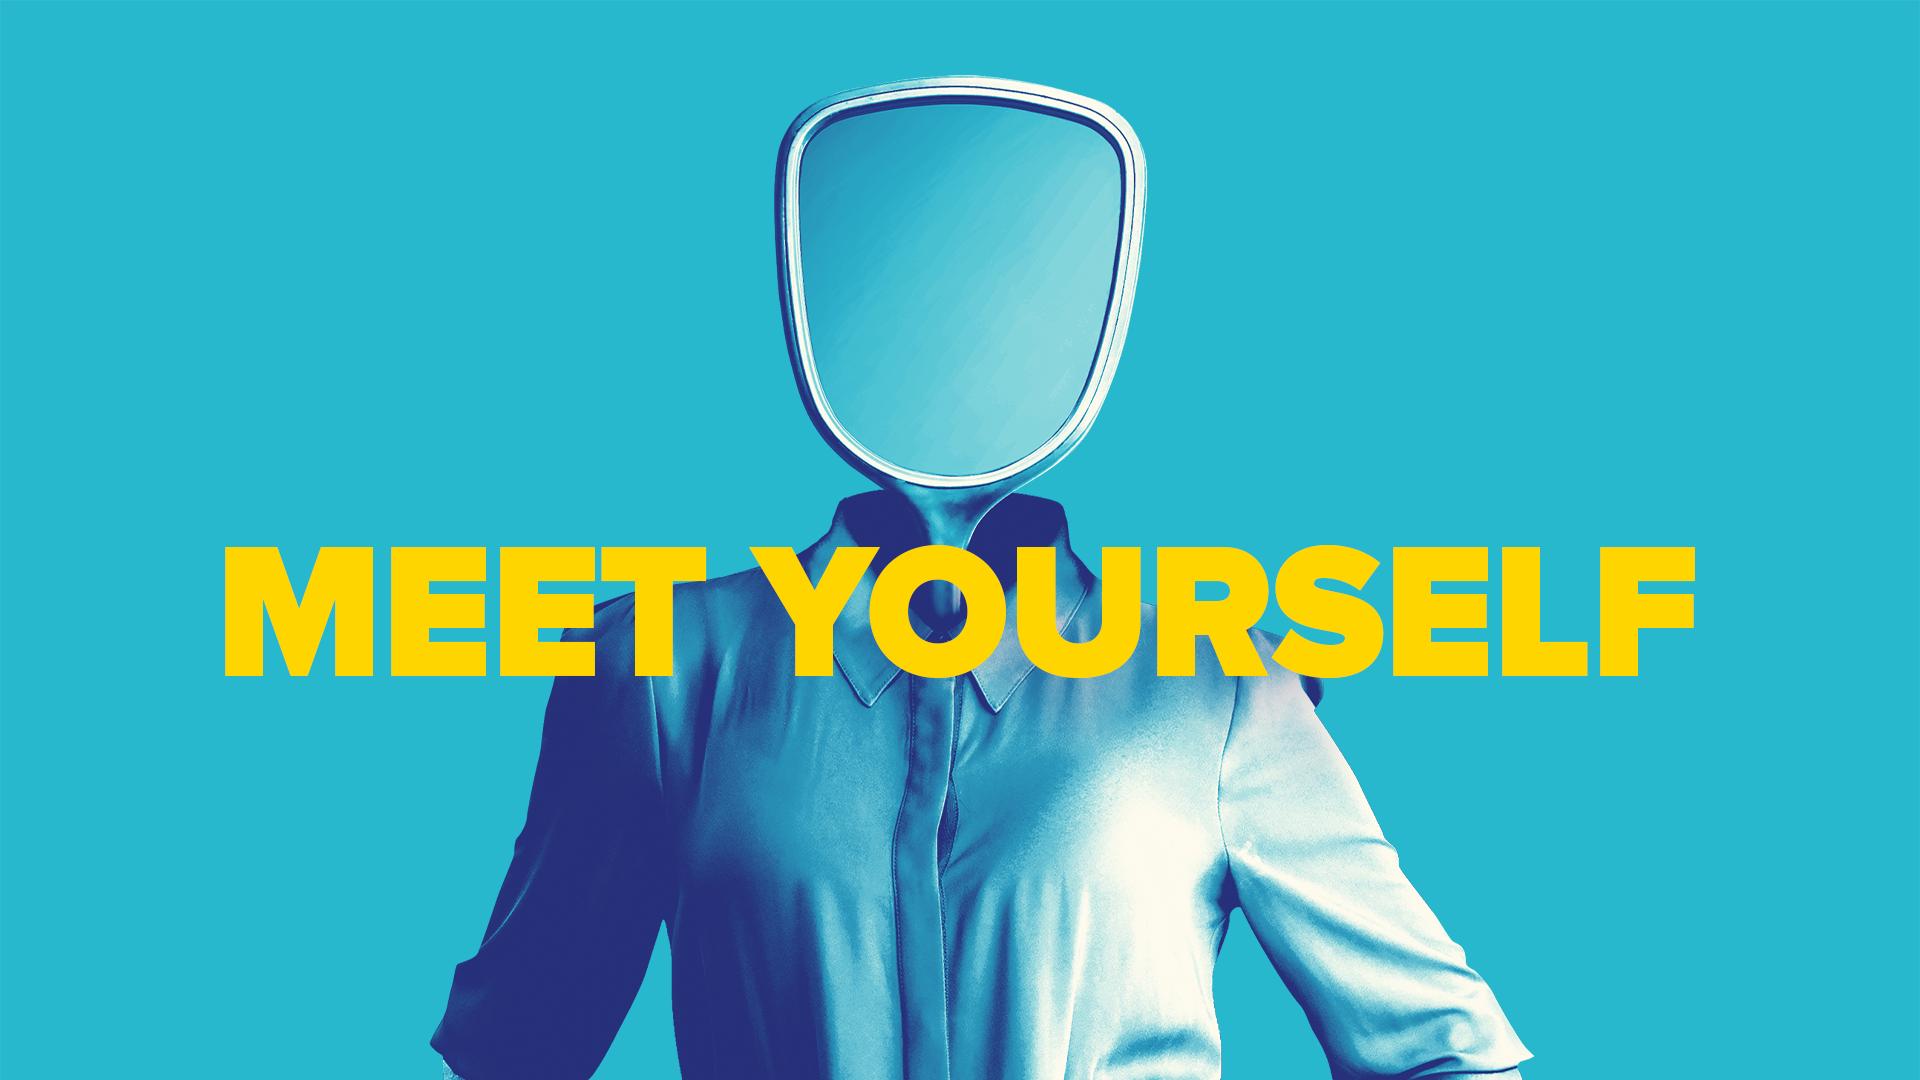 Goodism – Meet-yourself